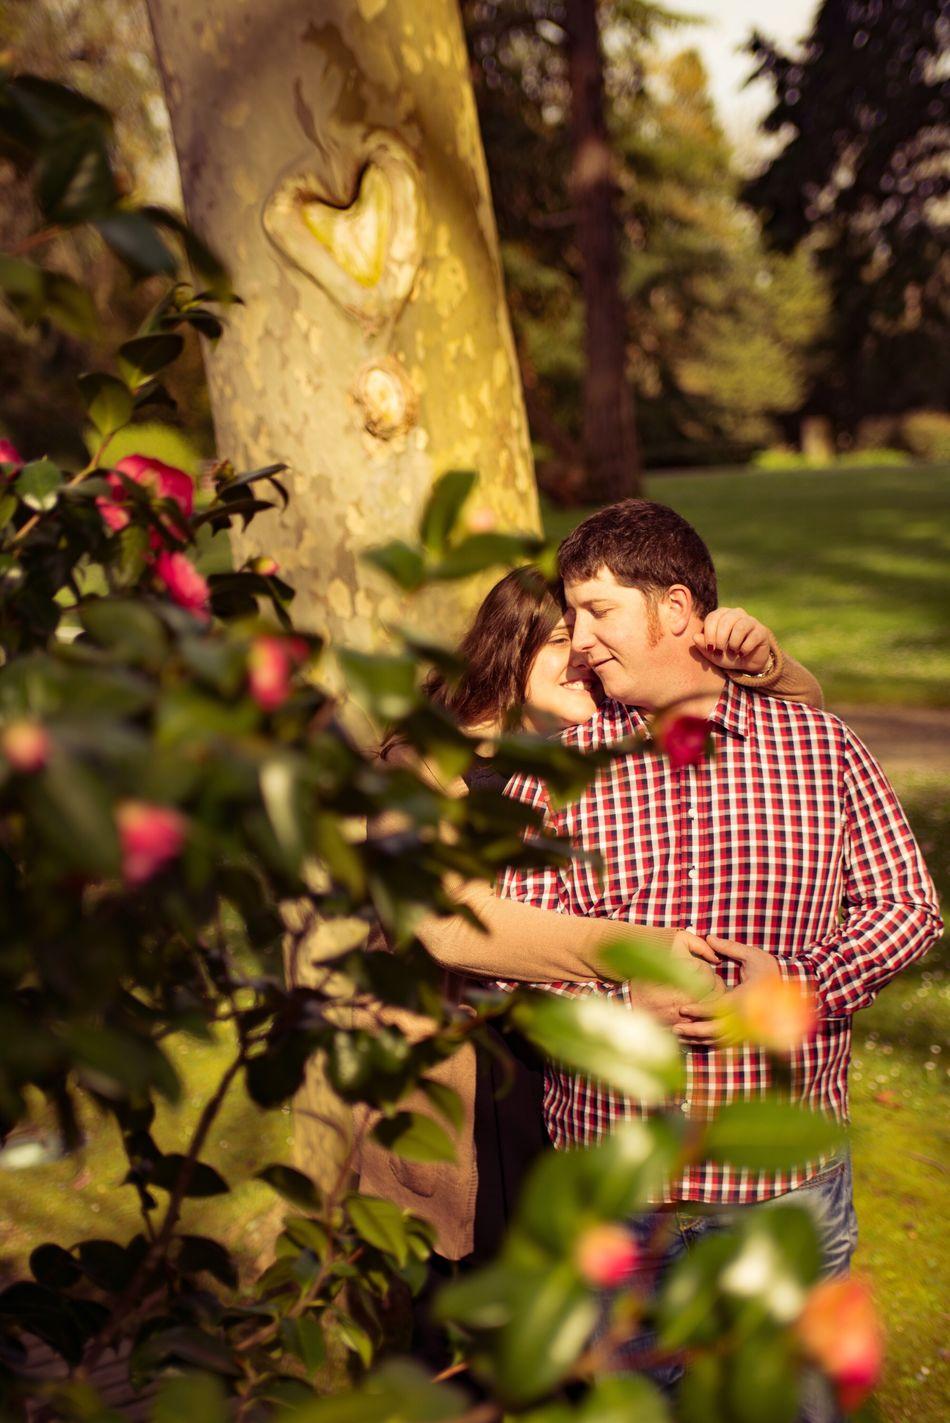 Beautiful stock photos of süße pärchen, one person, sunlight, beauty, beautiful woman